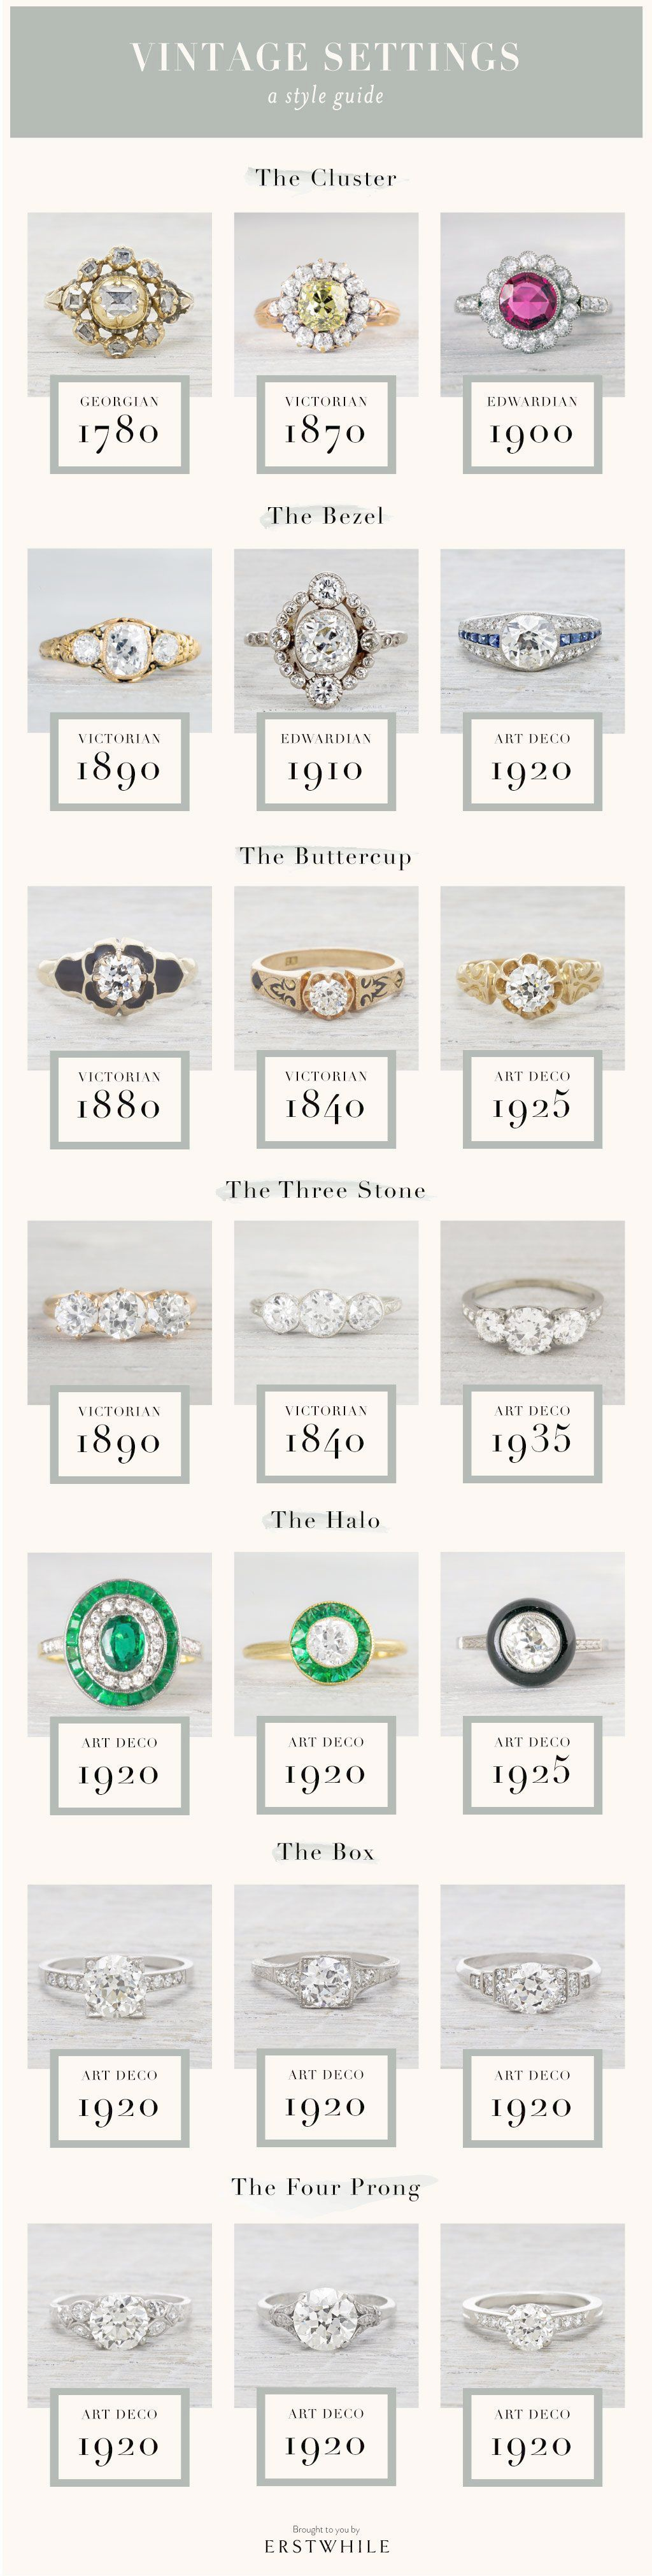 Jewellery New York before Vintage Wedding Rings Rose Gold